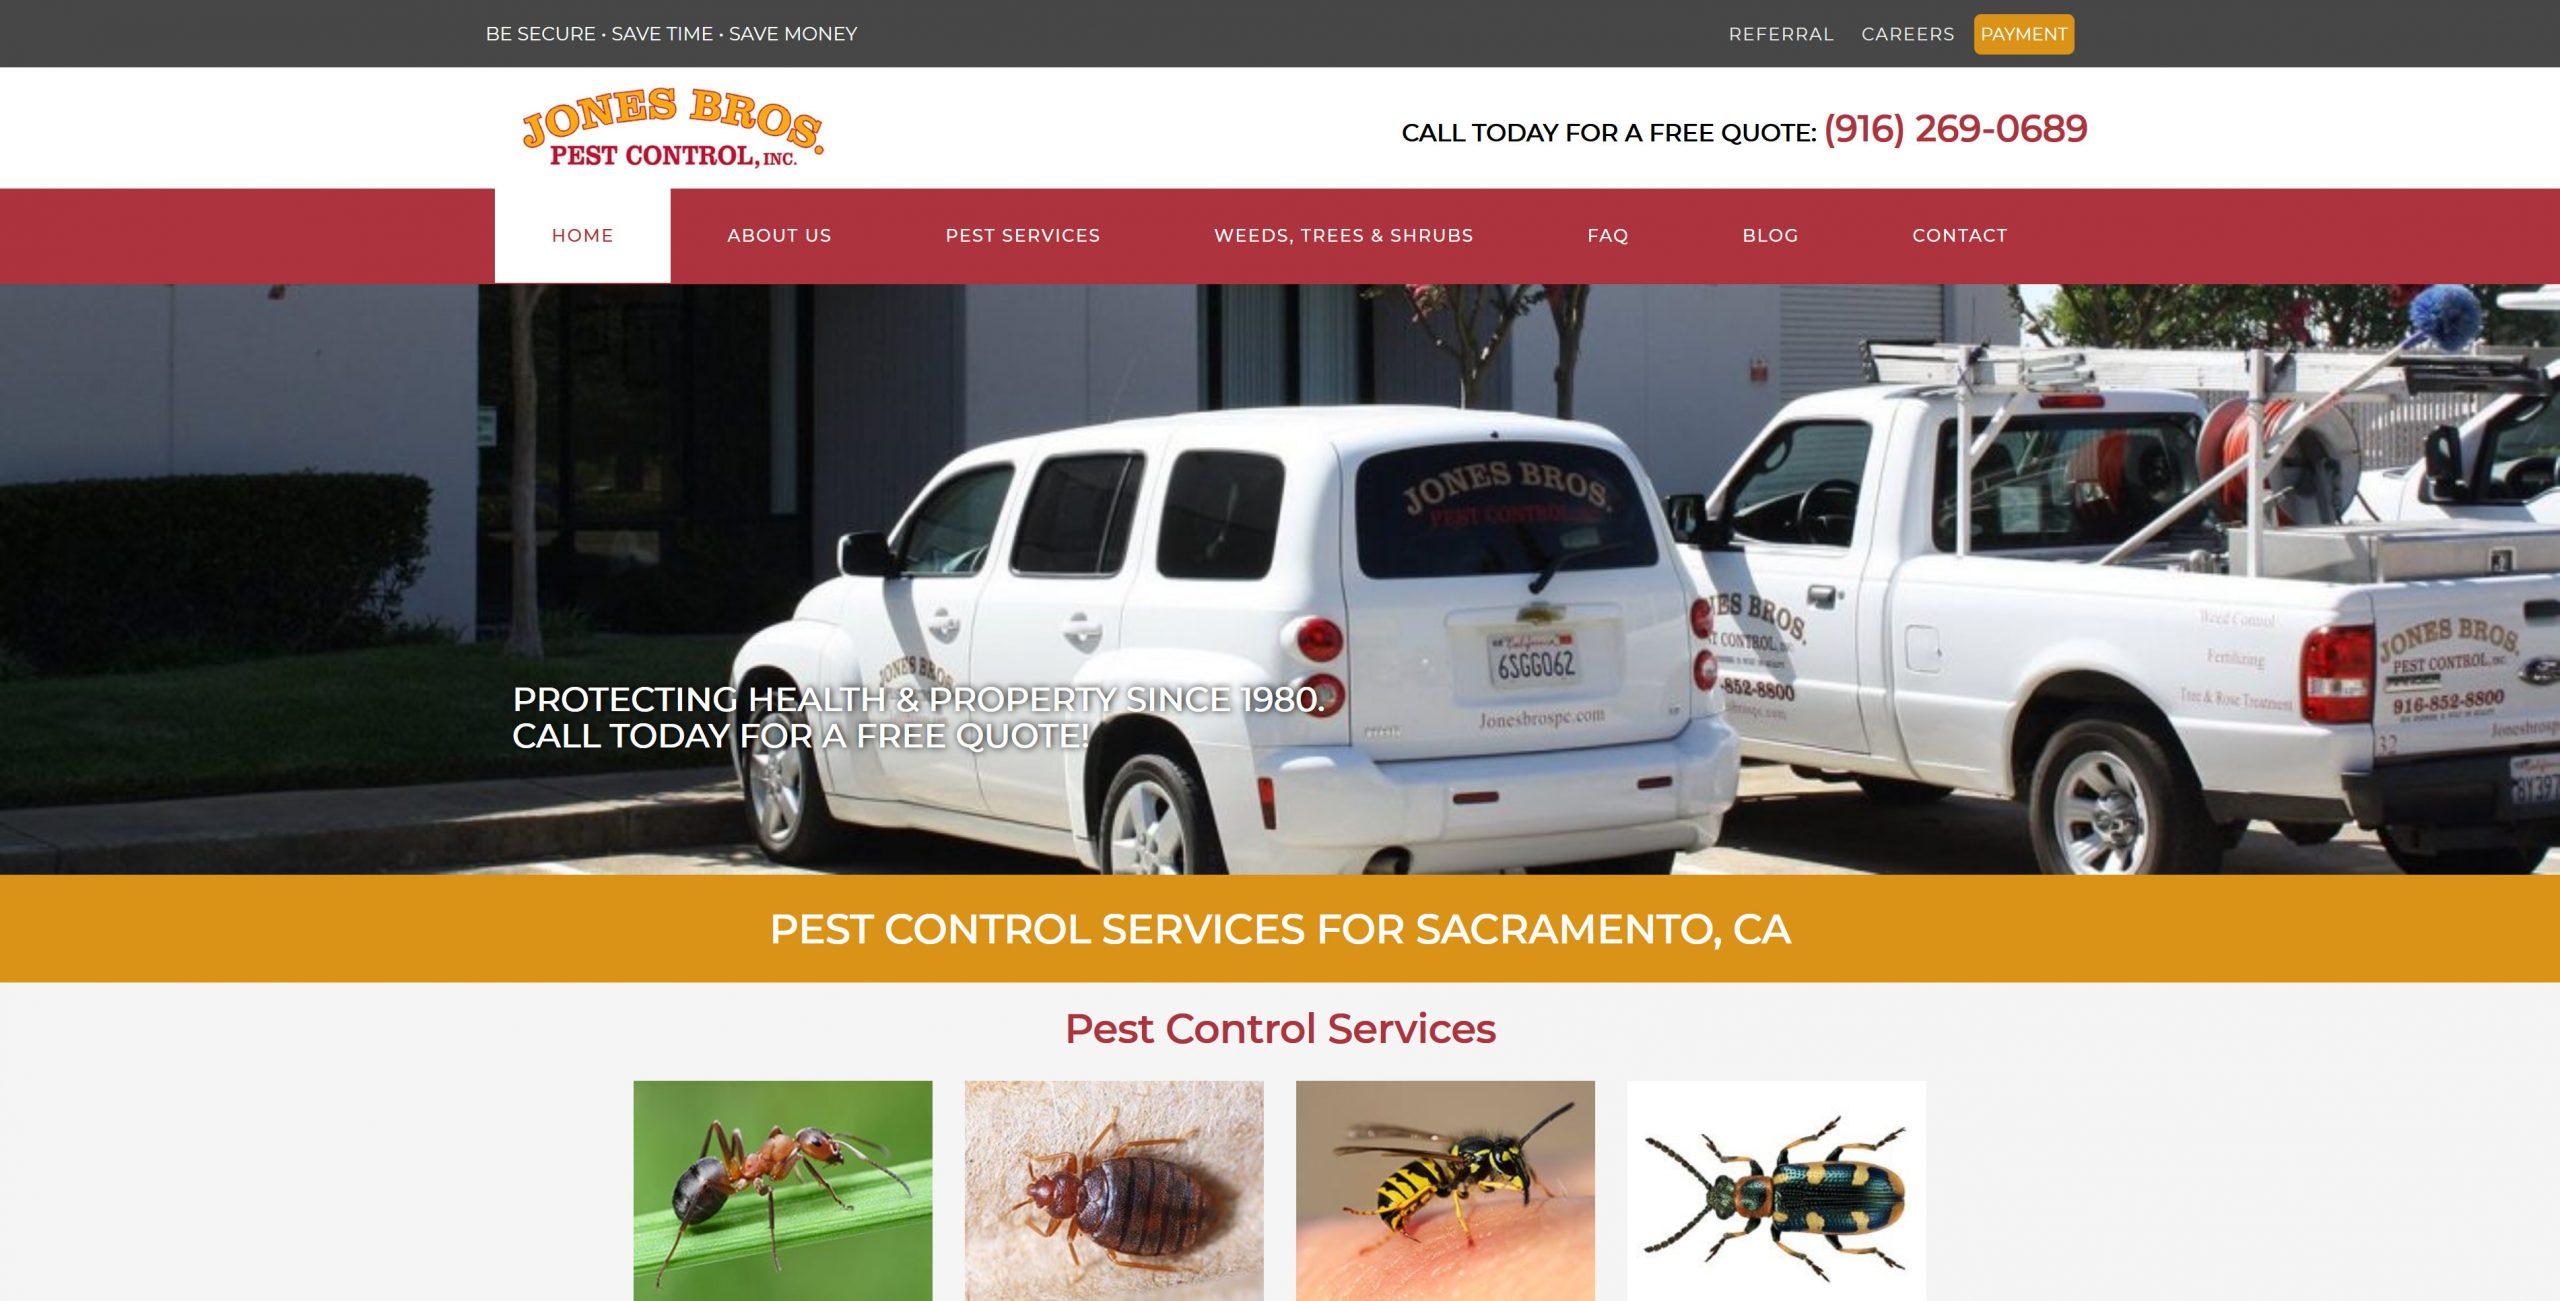 Jones Bros Pest Control, Inc.